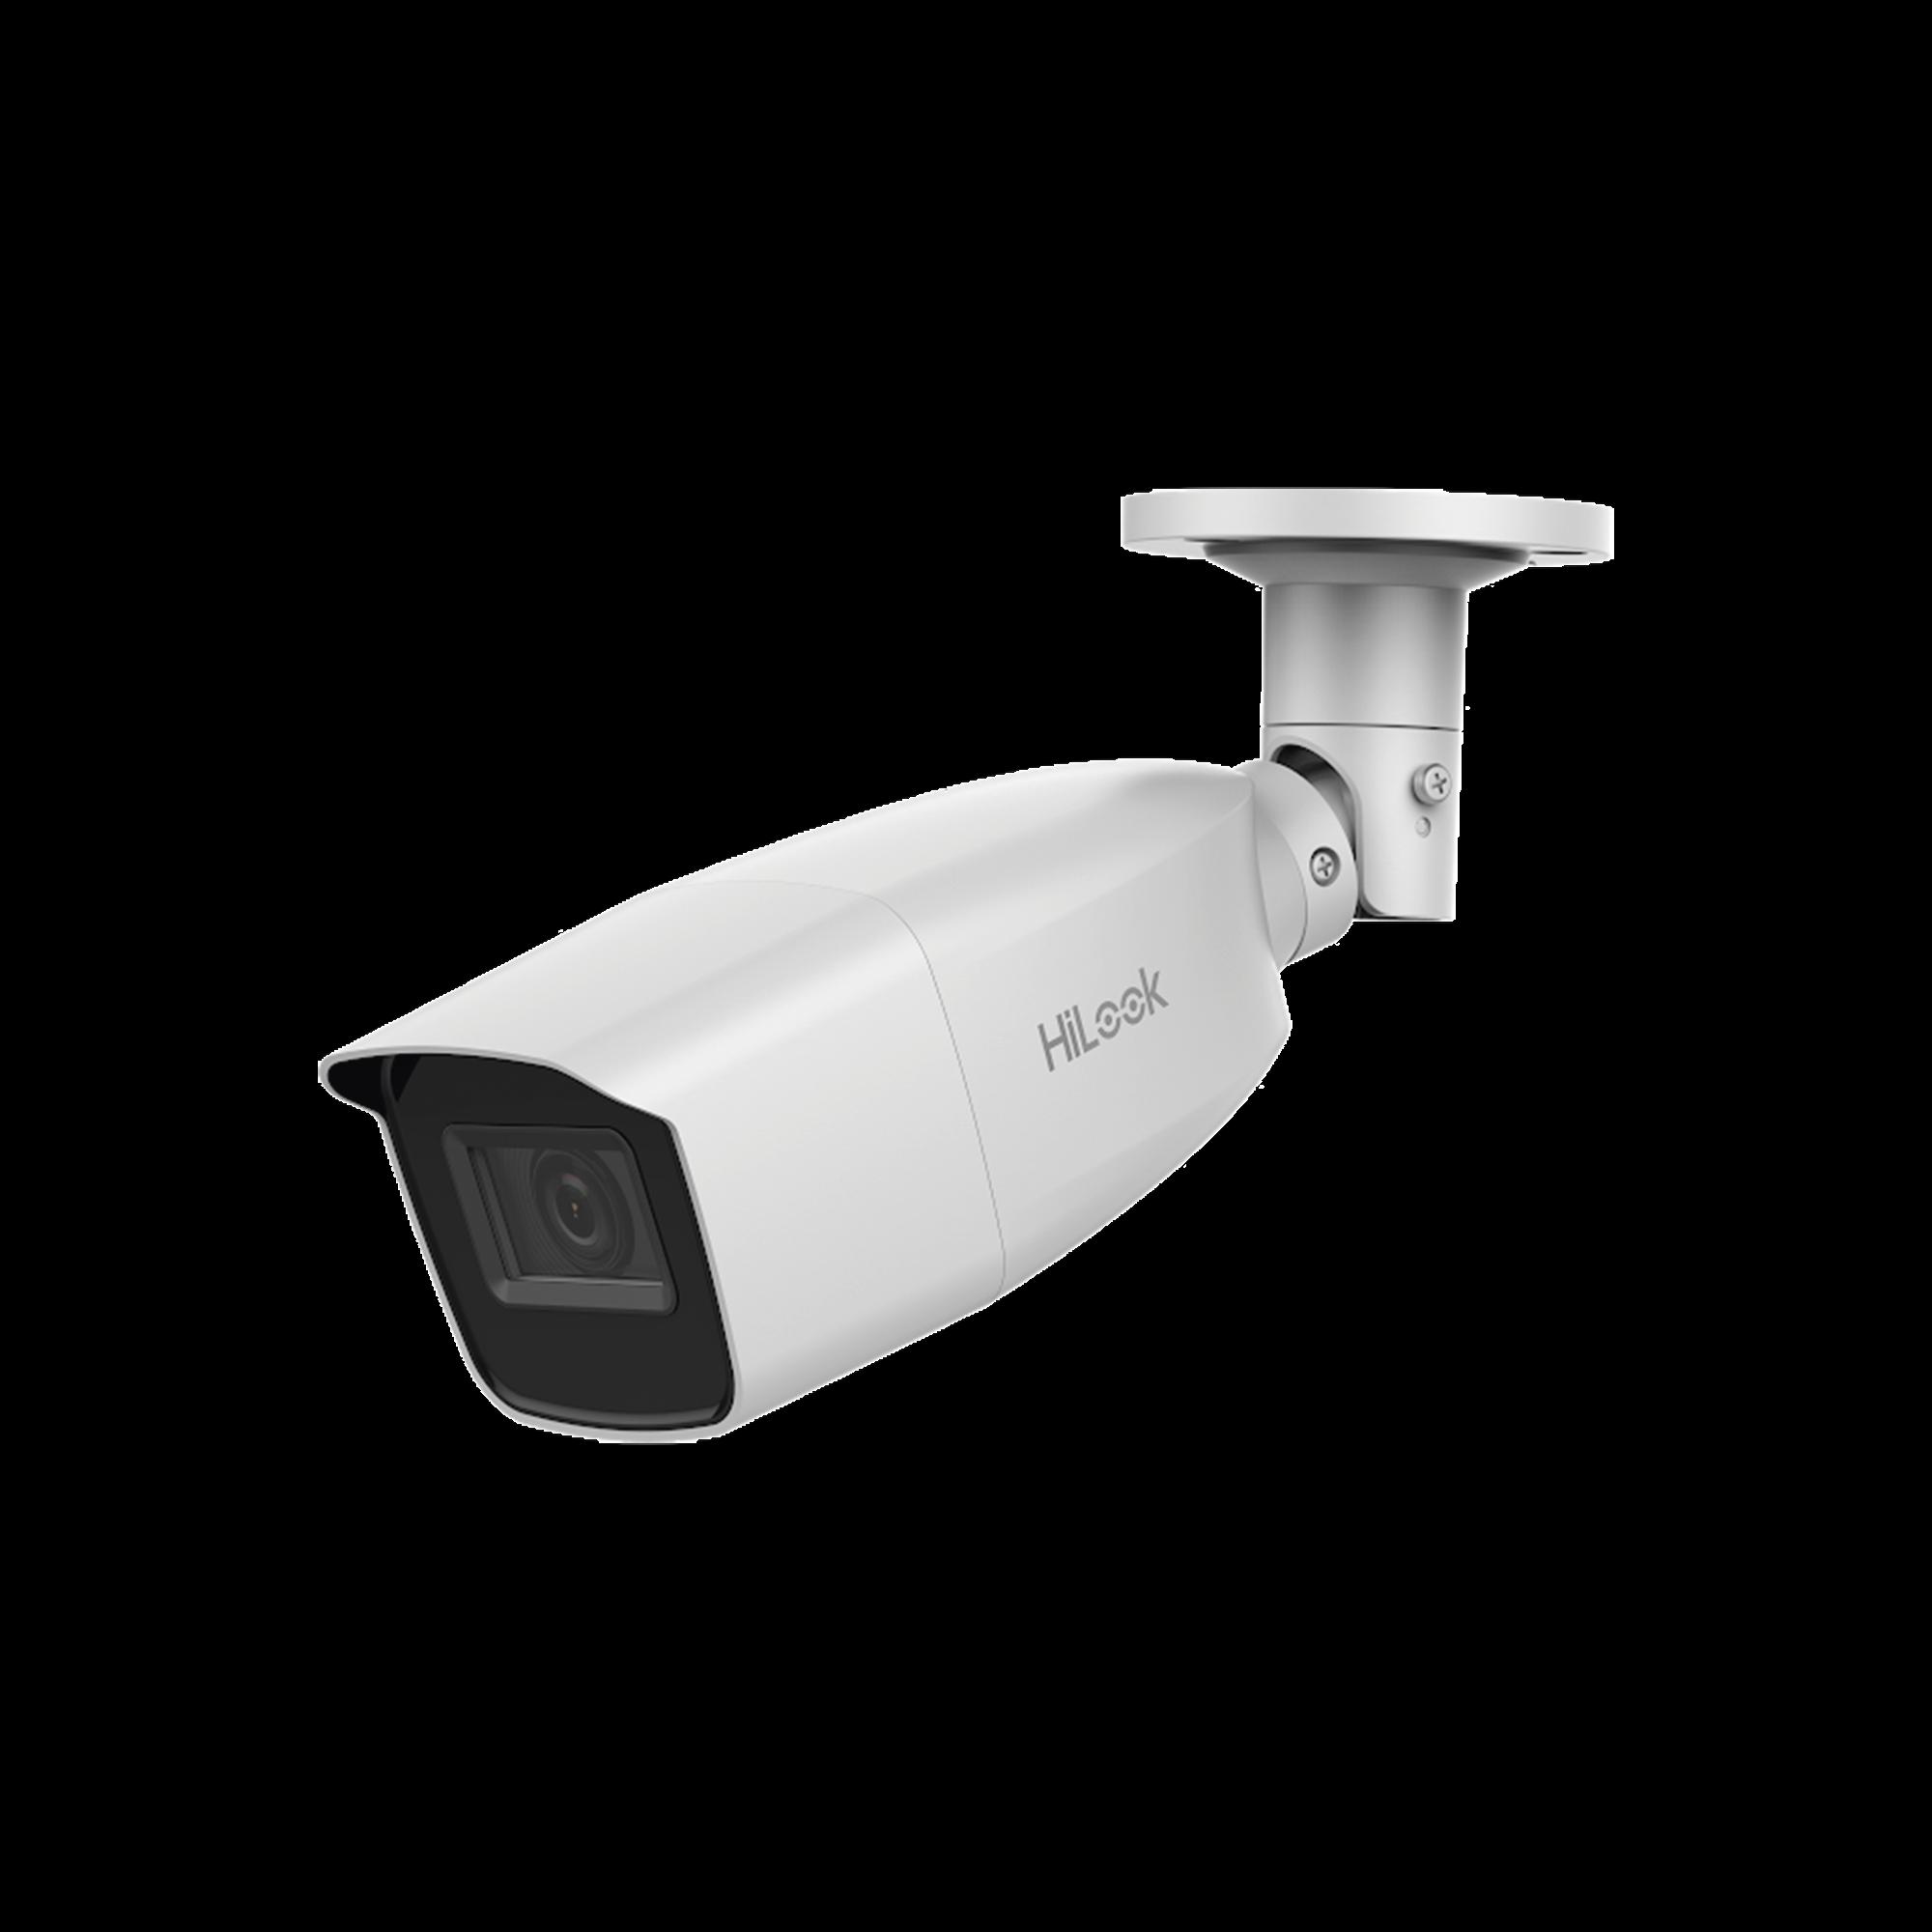 Bullet TURBOHD 2 Megapixel (1080p) / Lente Mot. 2.7 a 13.5 mm / METAL / IR EXIR Inteligente 70 mts / Exterior IP66 / WDR 120 dB / TVI-AHD-CVI-CVBS